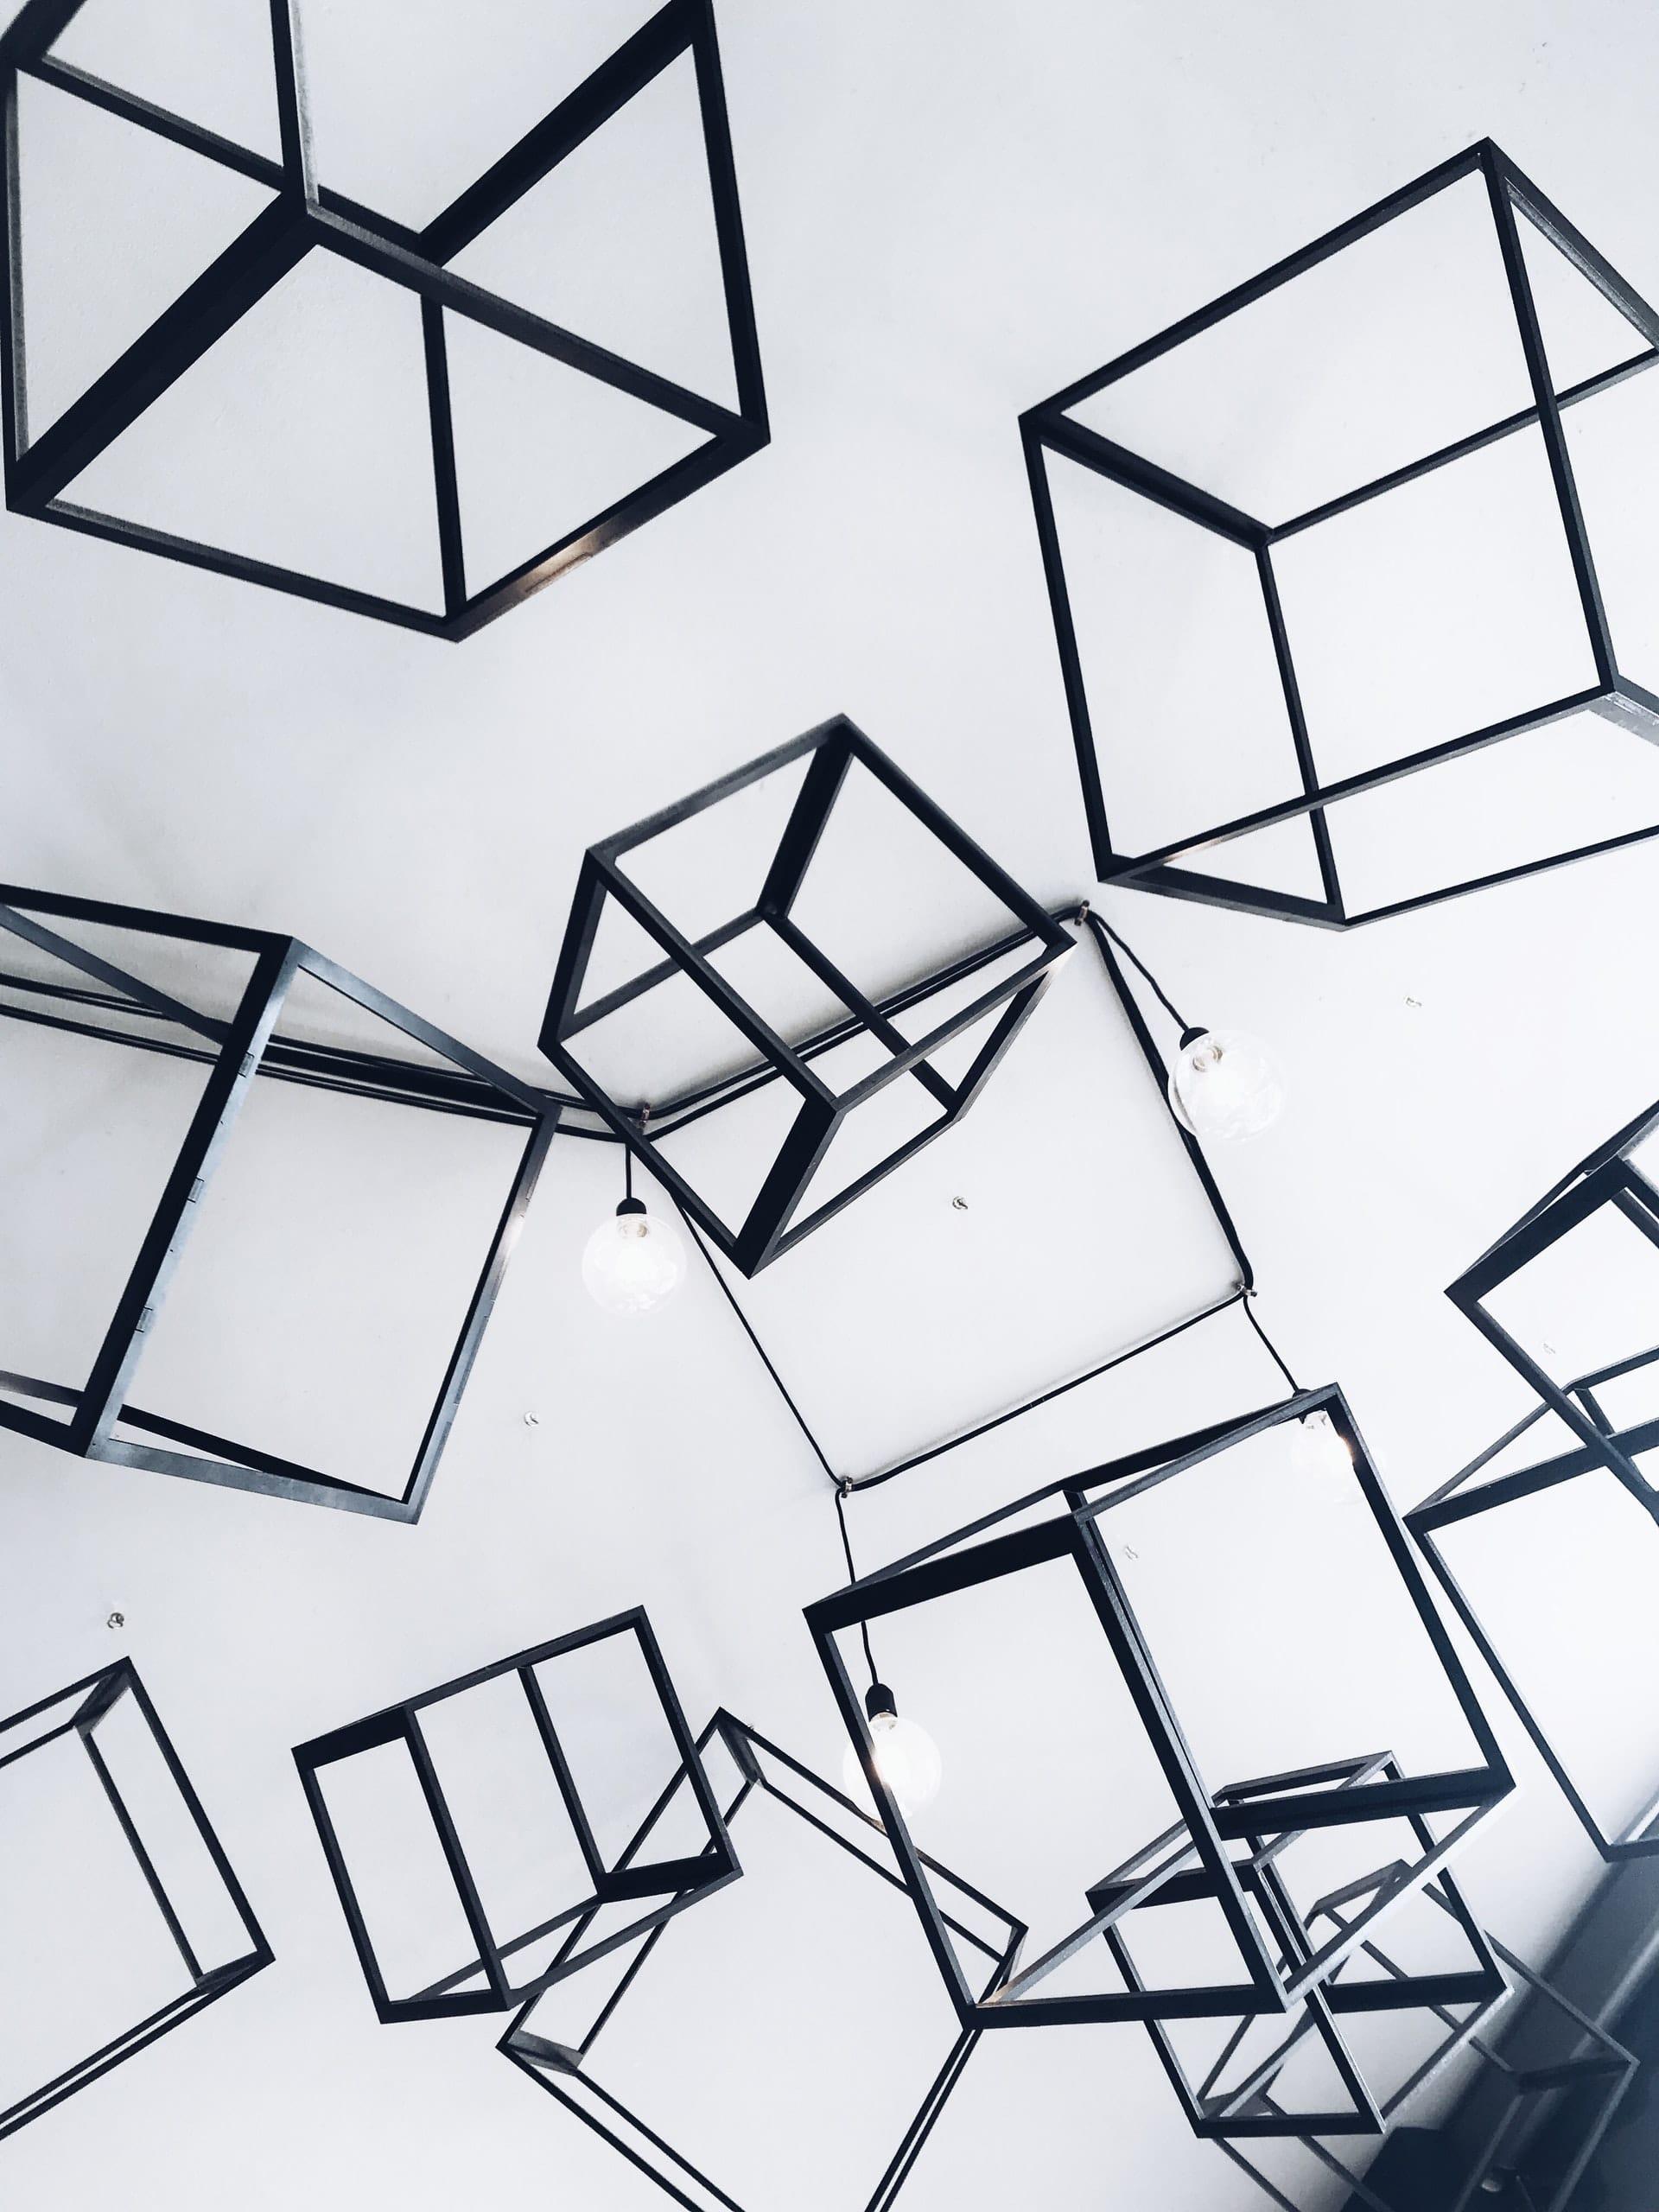 angle-architecture-art-1005644